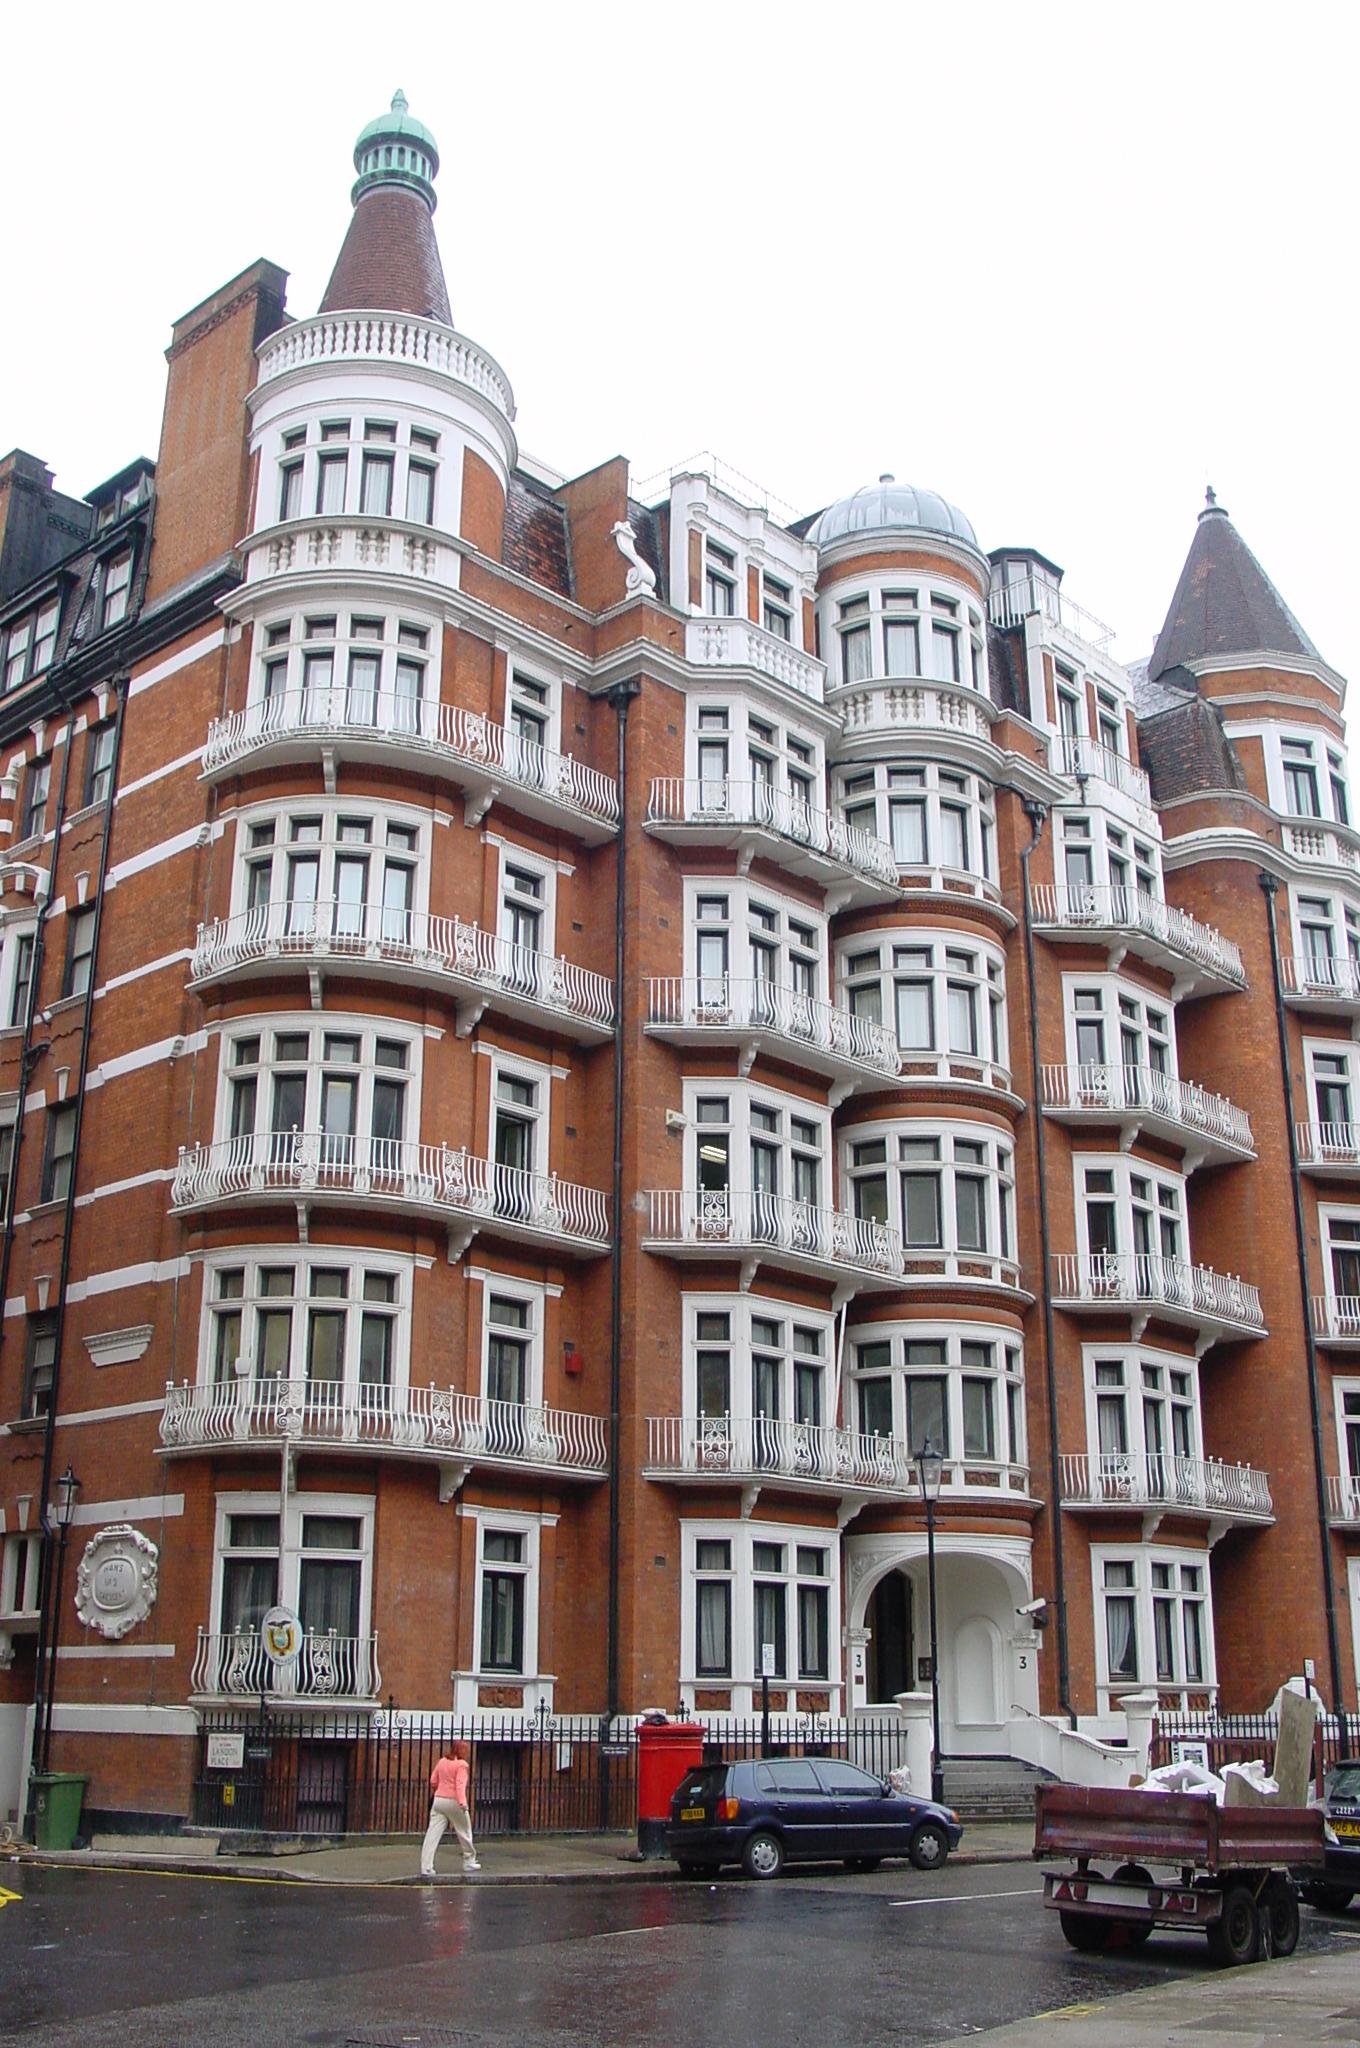 Hans Place, Knightsbridge